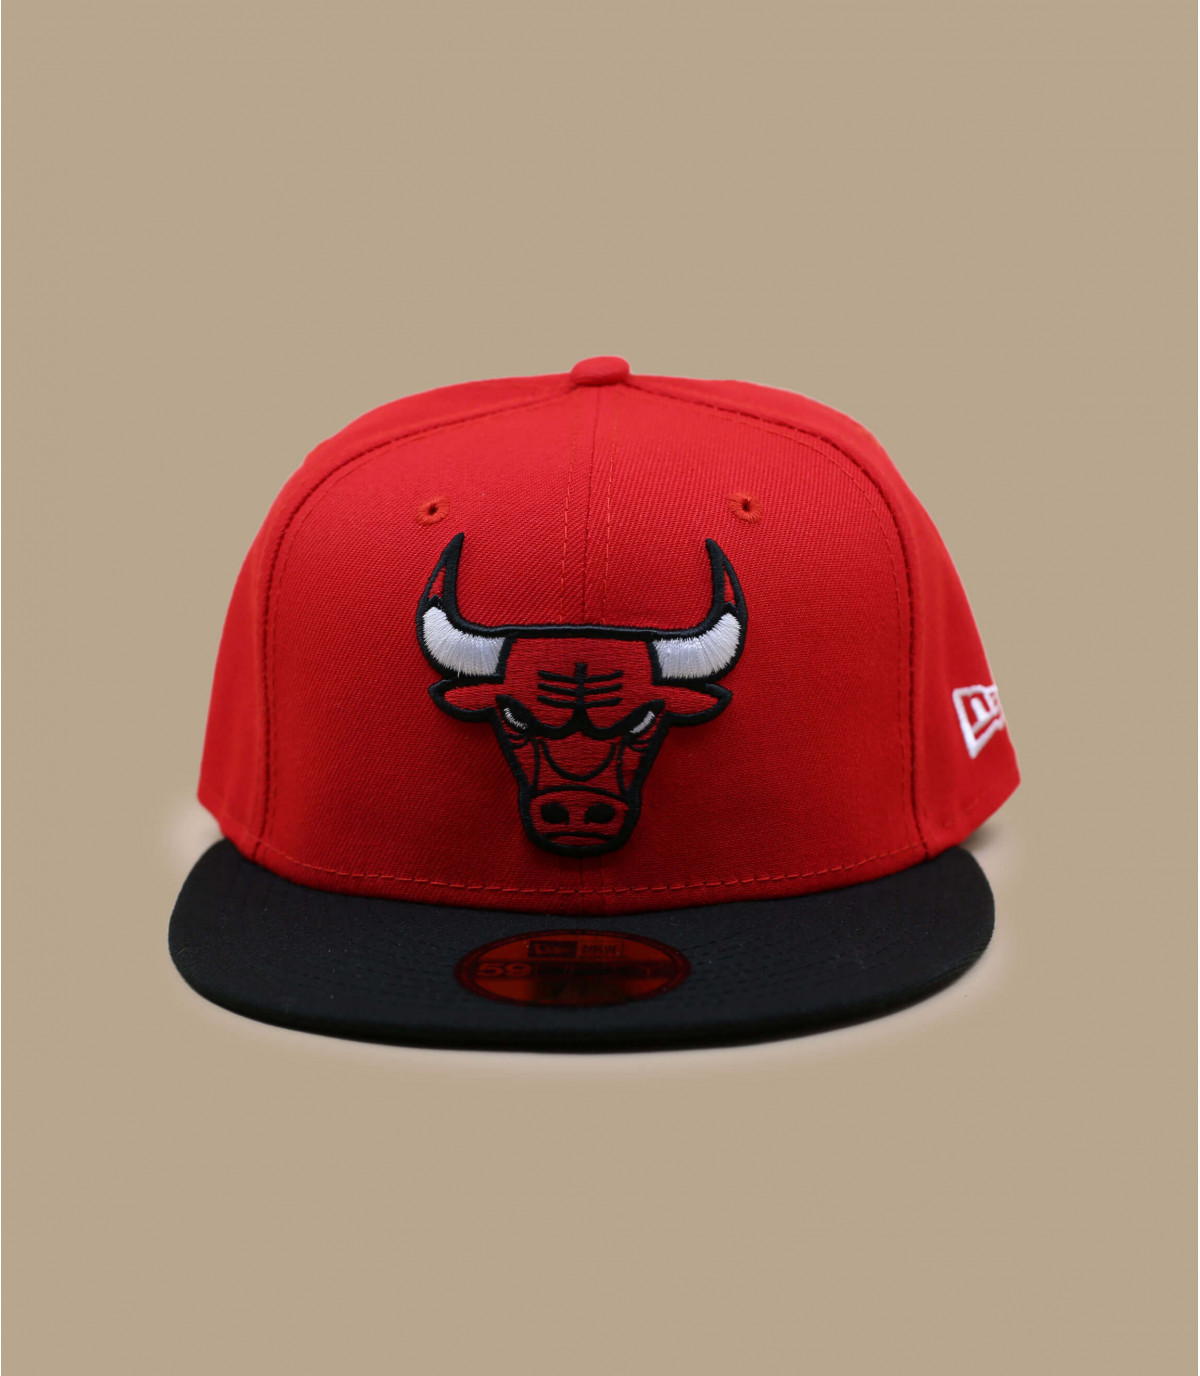 0f9f0017034b ... Détails Casquette Chicago Bulls 59fifty rouge - image ...